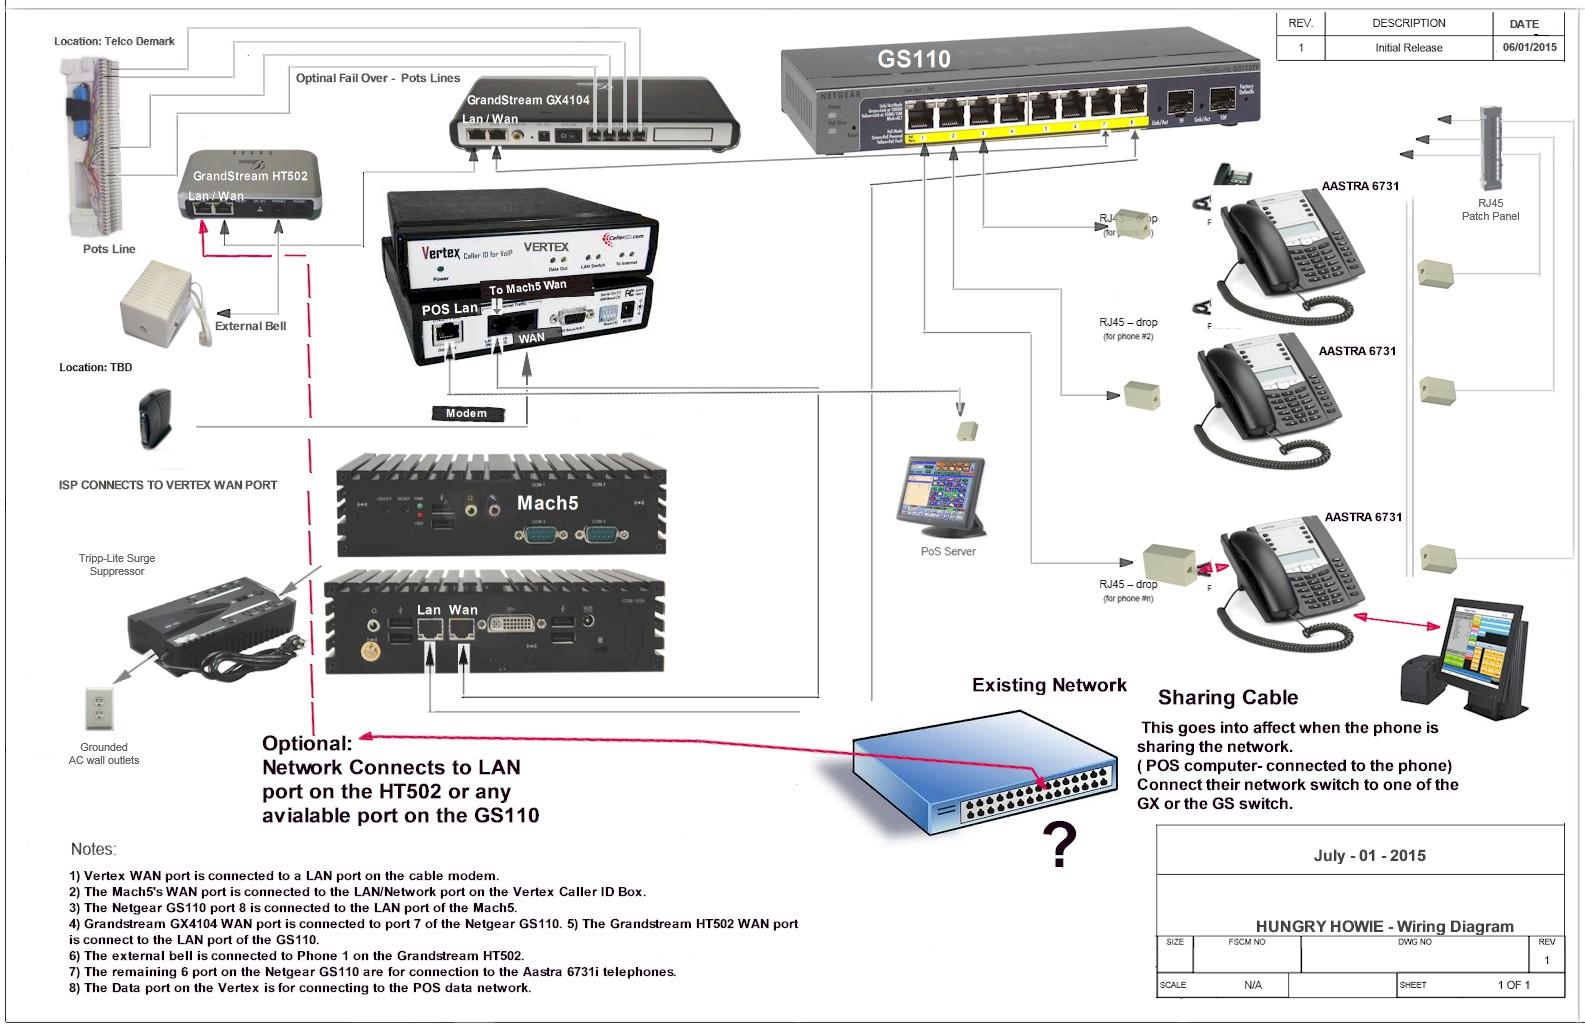 hight resolution of wan wiring diagram wiring diagrams lolhungry howie wiring diagram modem diagram 1 vertex wan port